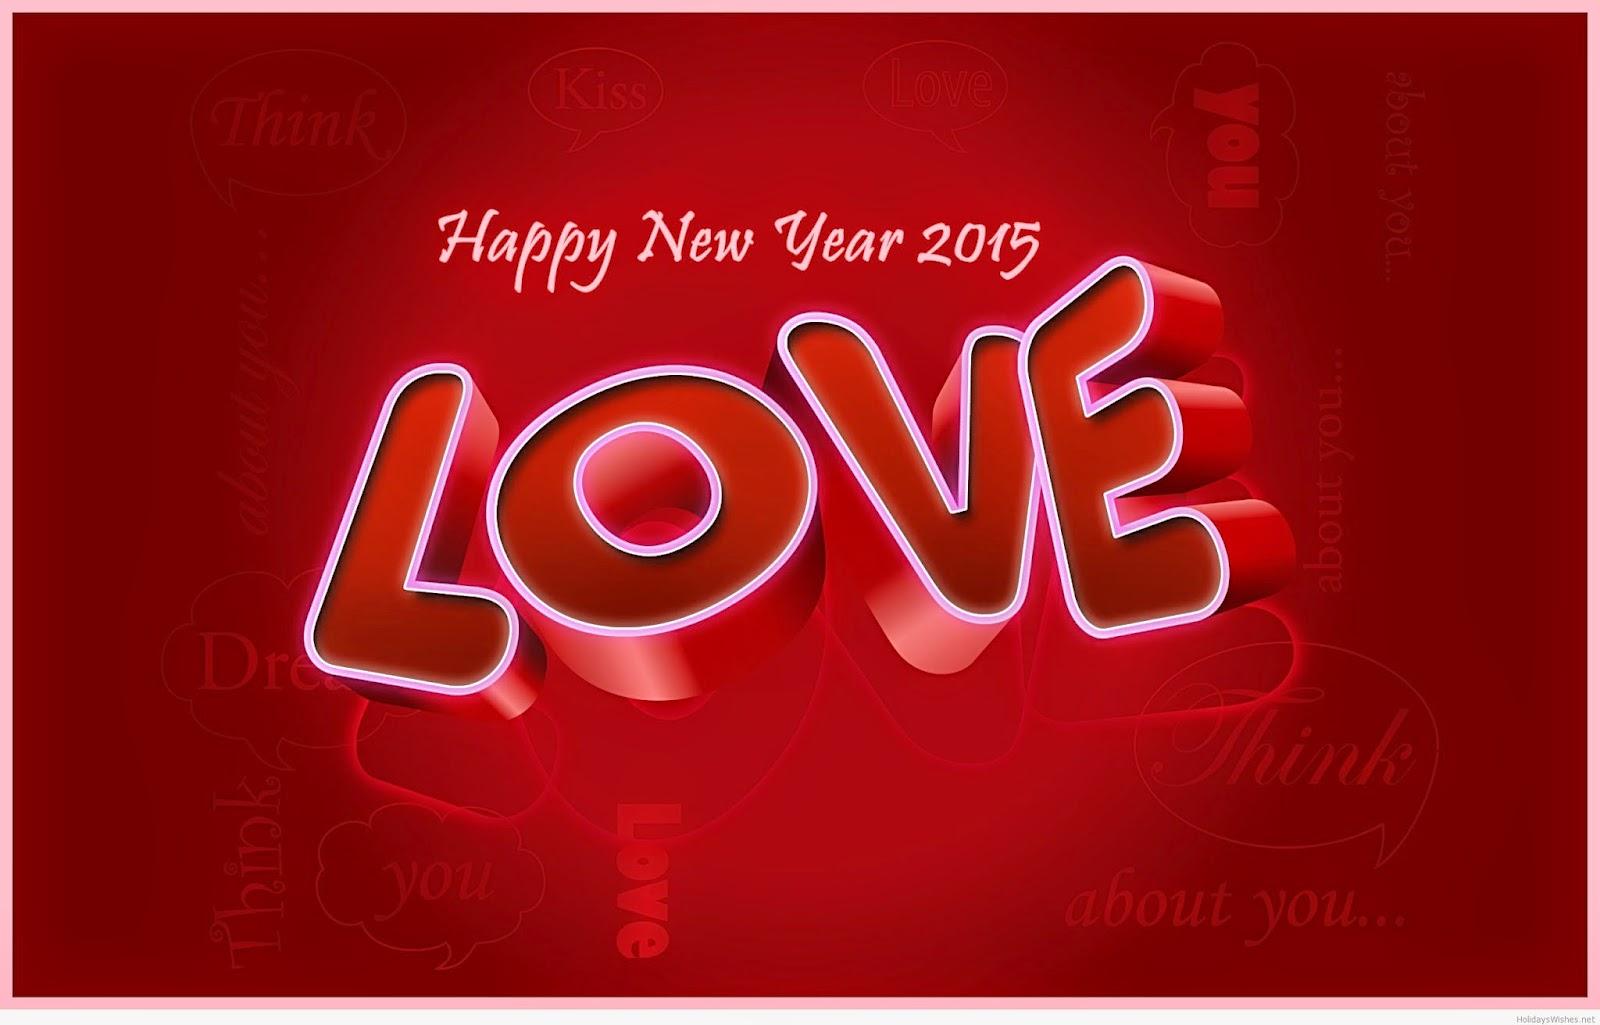 1600 x 1025 jpeg 147kB, Happynewyear2015imagesdownload | New Calendar ...